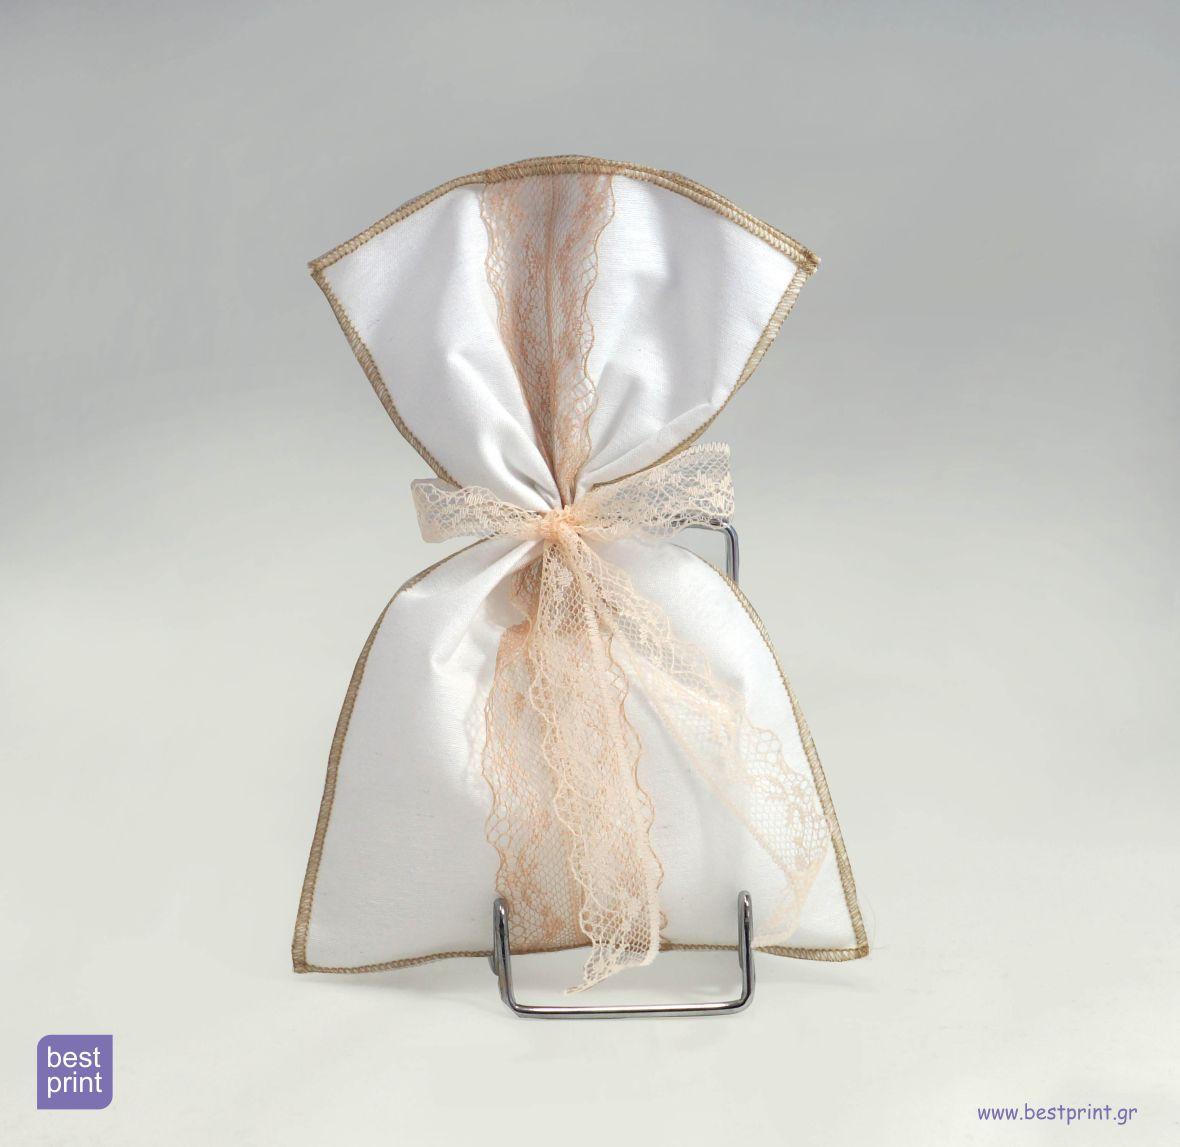 dad41218fbc5 Υλικά για Μπομπονιέρες Γάμου Προσκλητήρια